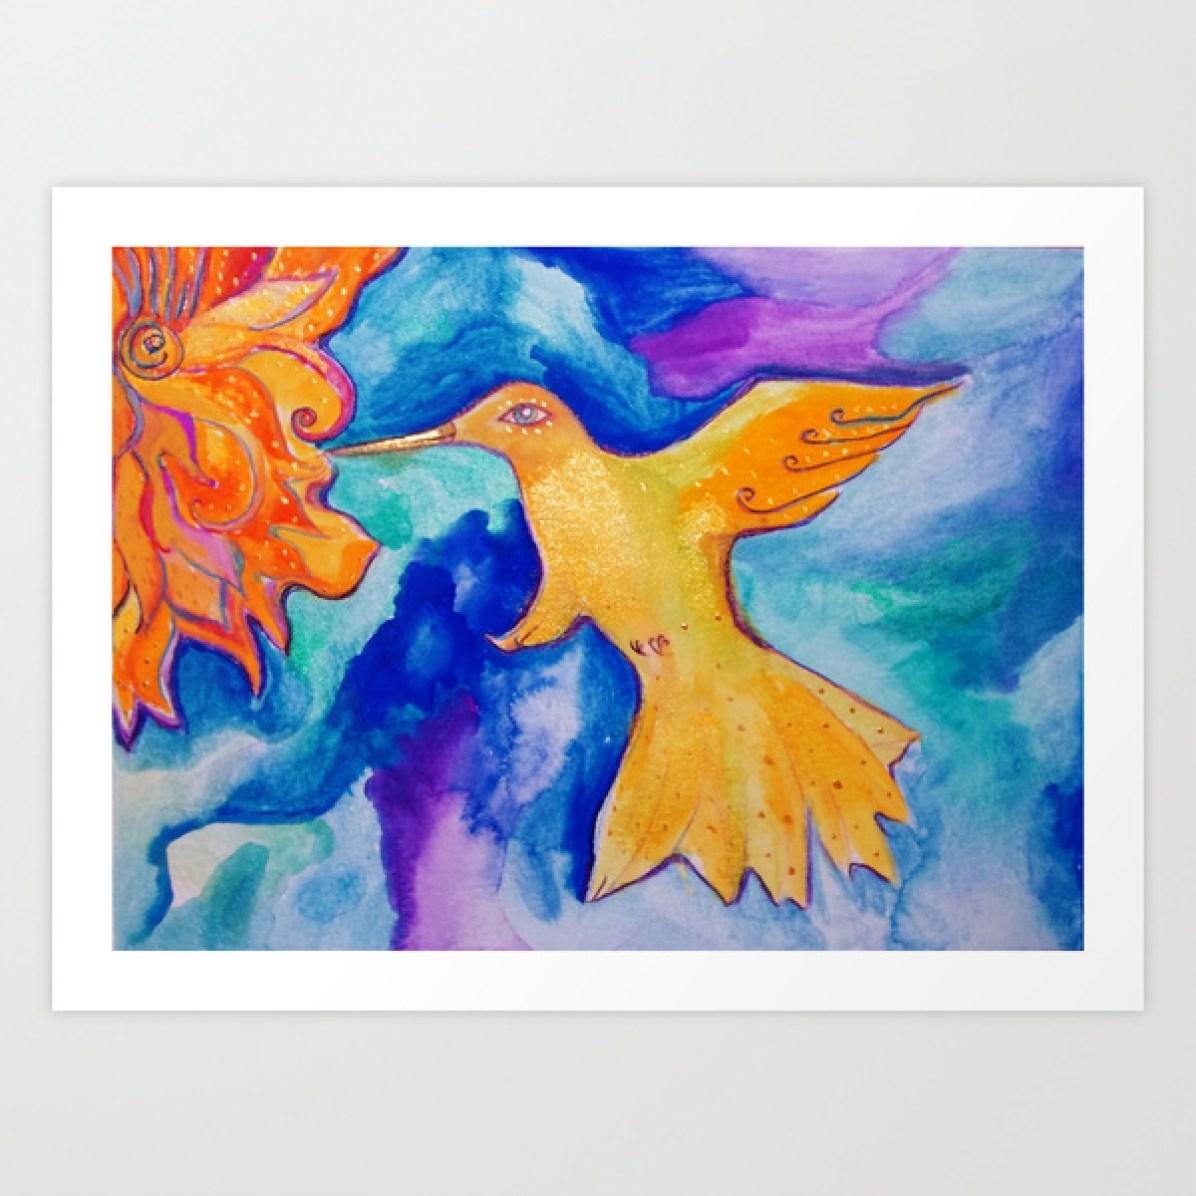 Sun Bird by Garden Of Delights